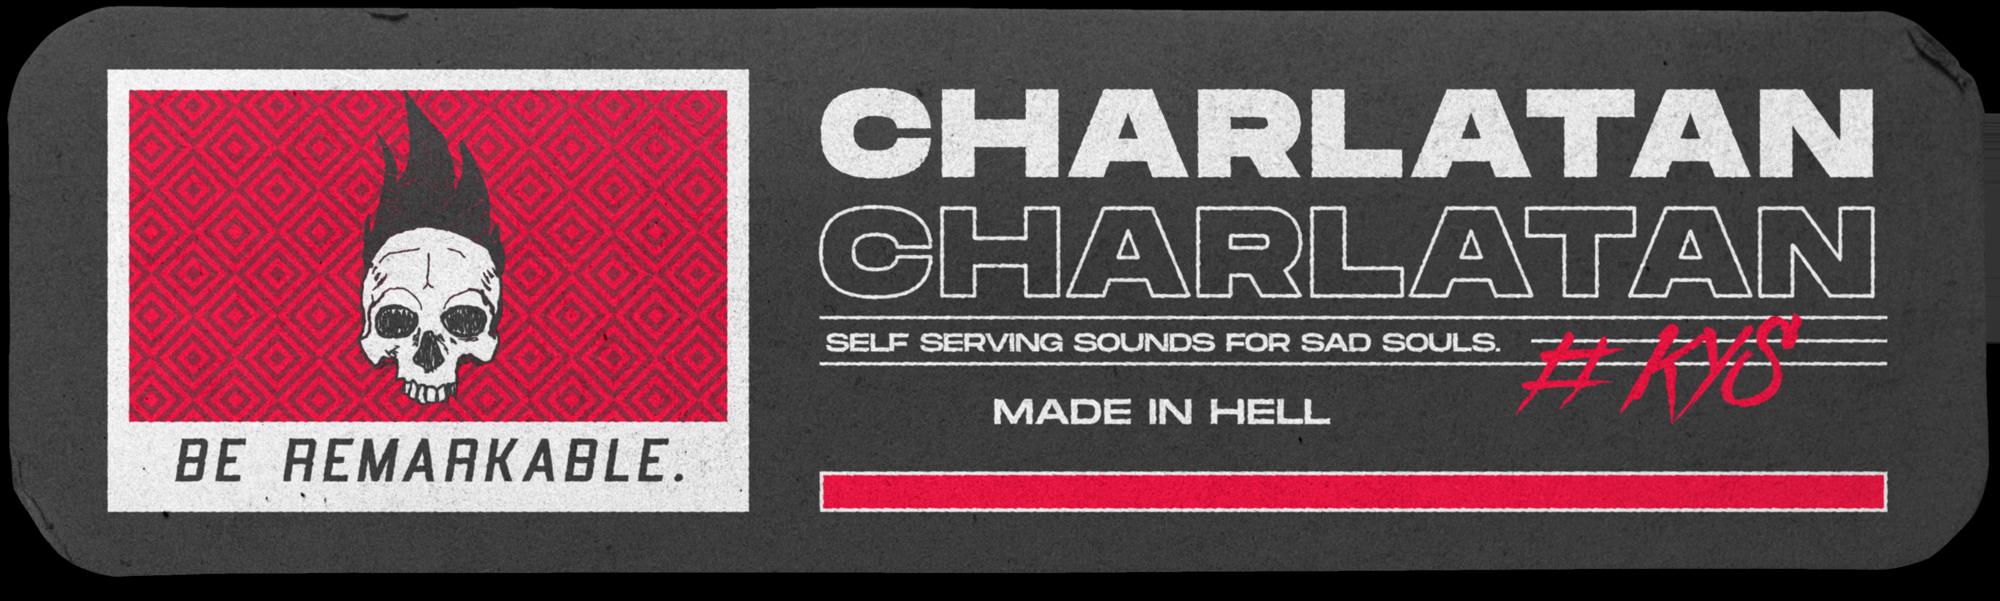 Charlatan banner that includes logo.